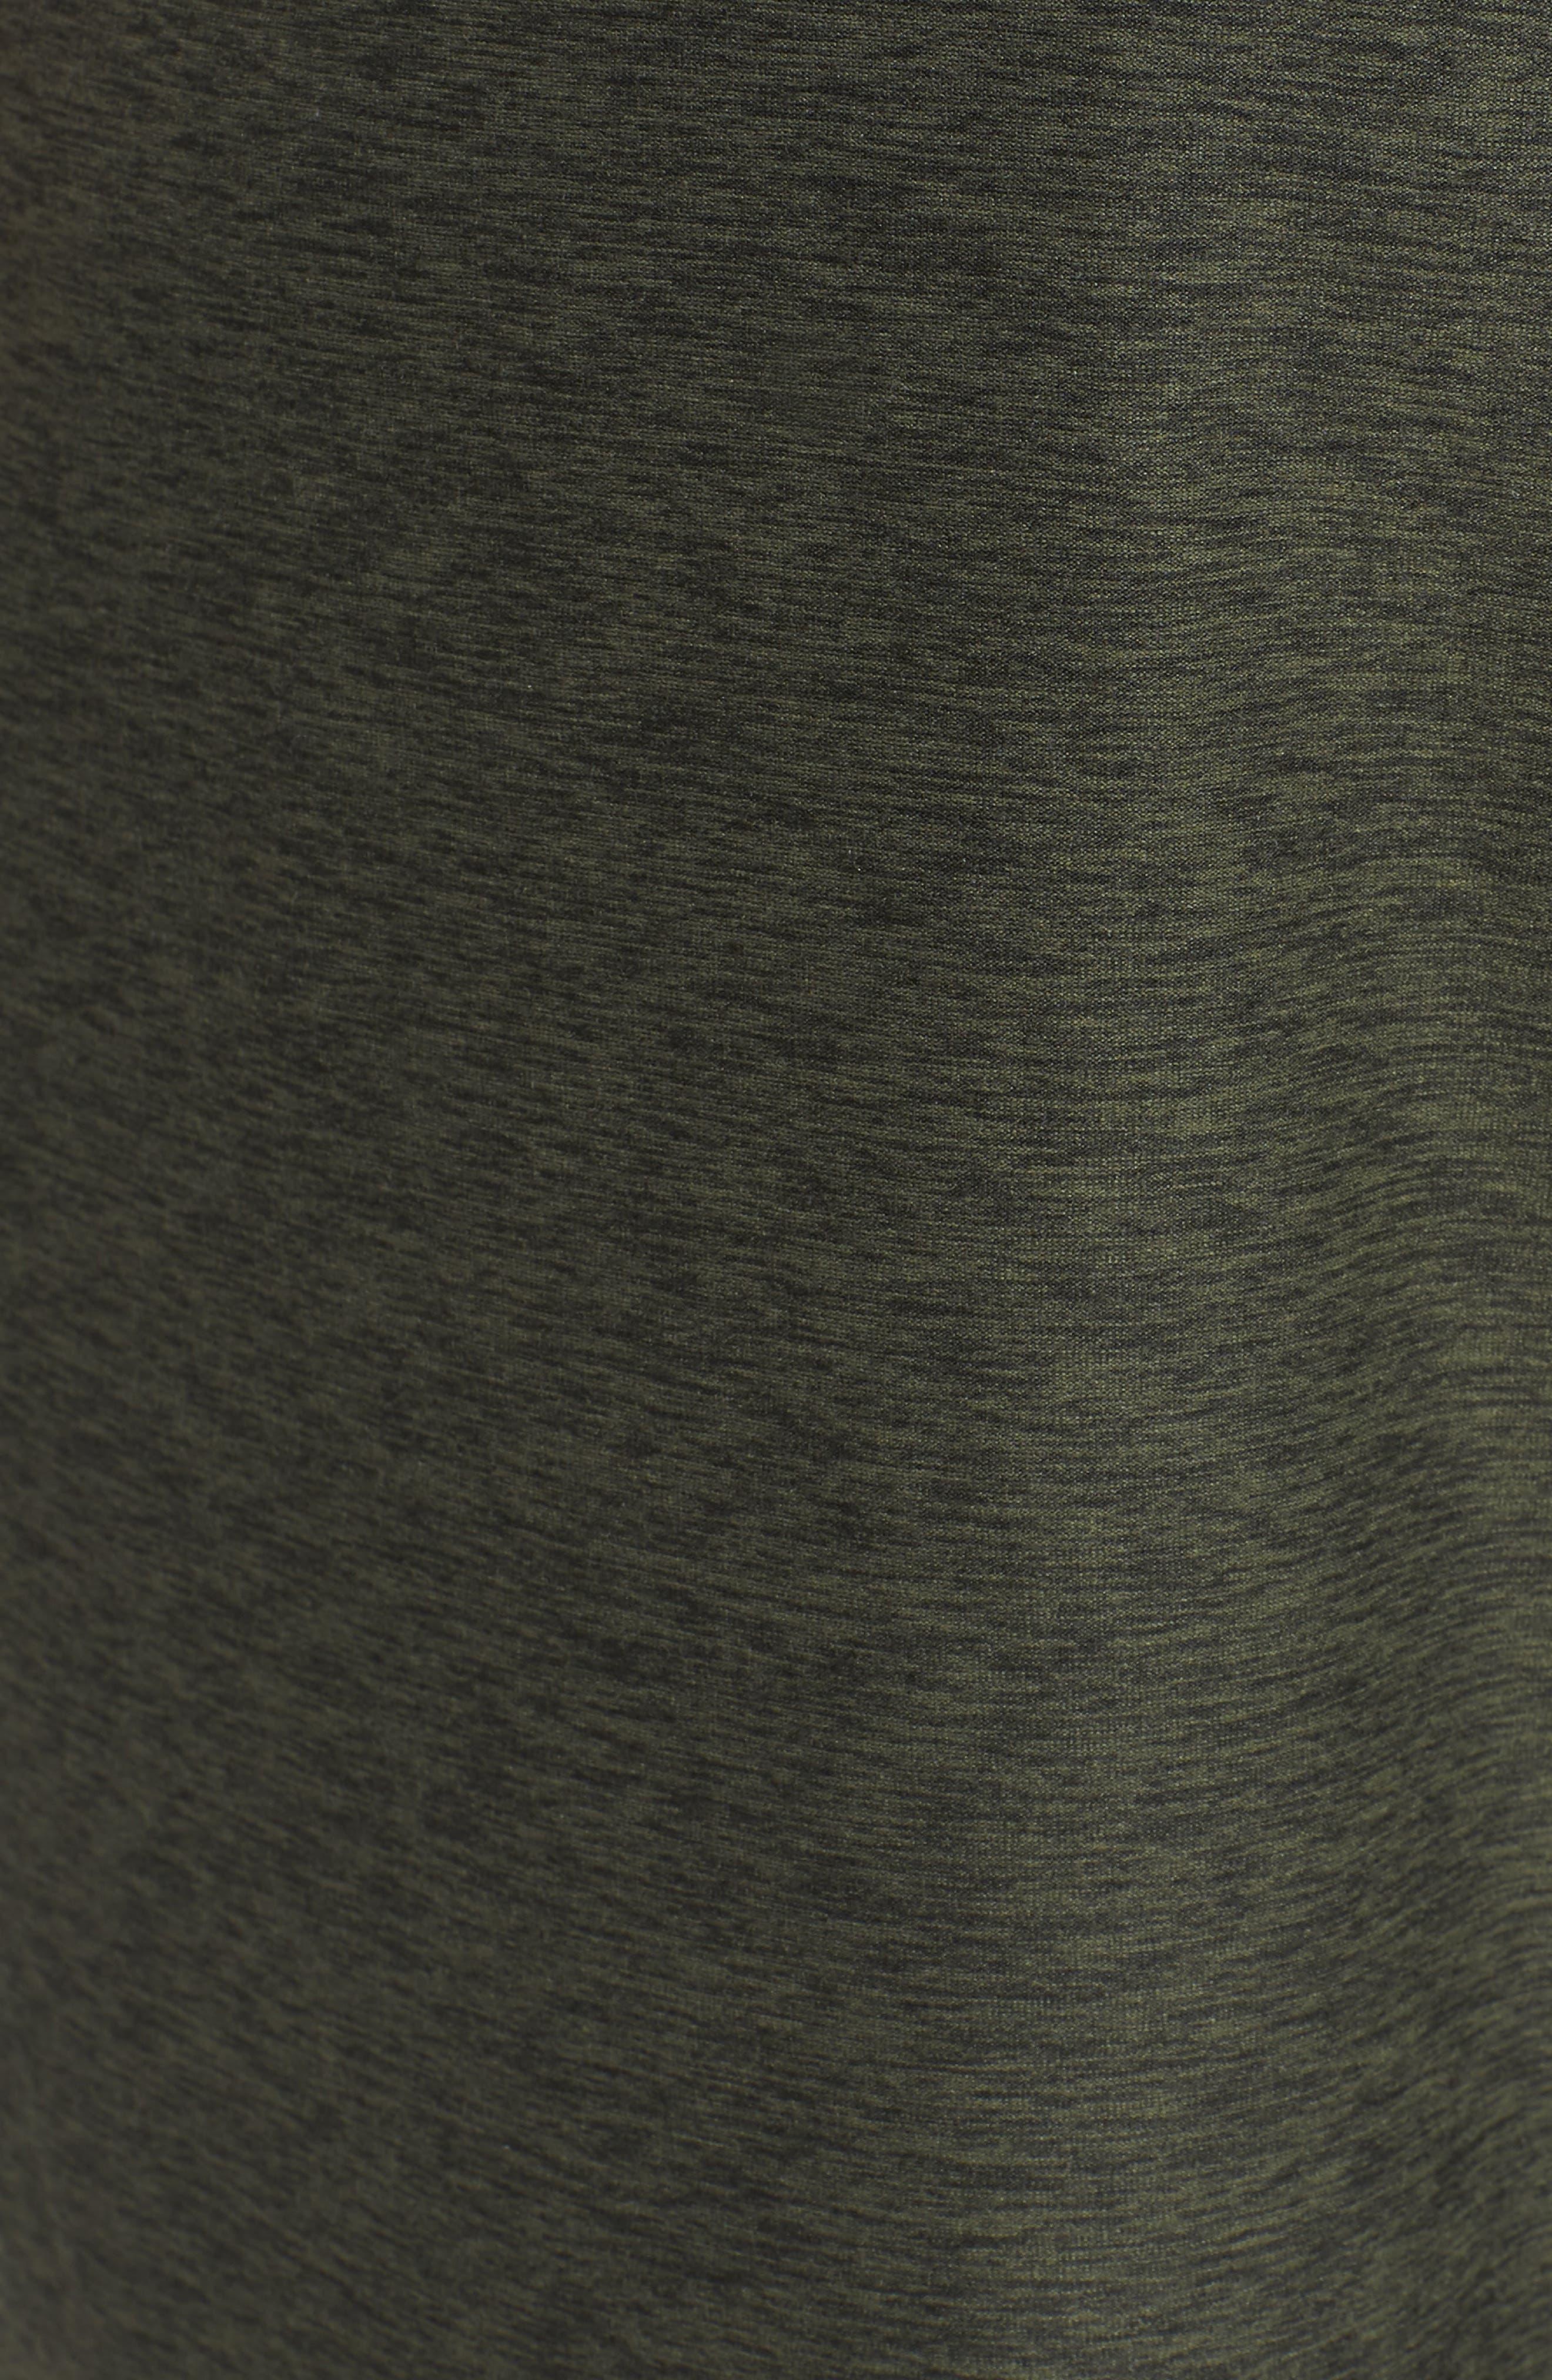 Anticipate Shorts,                             Alternate thumbnail 5, color,                             Dark Covert Green